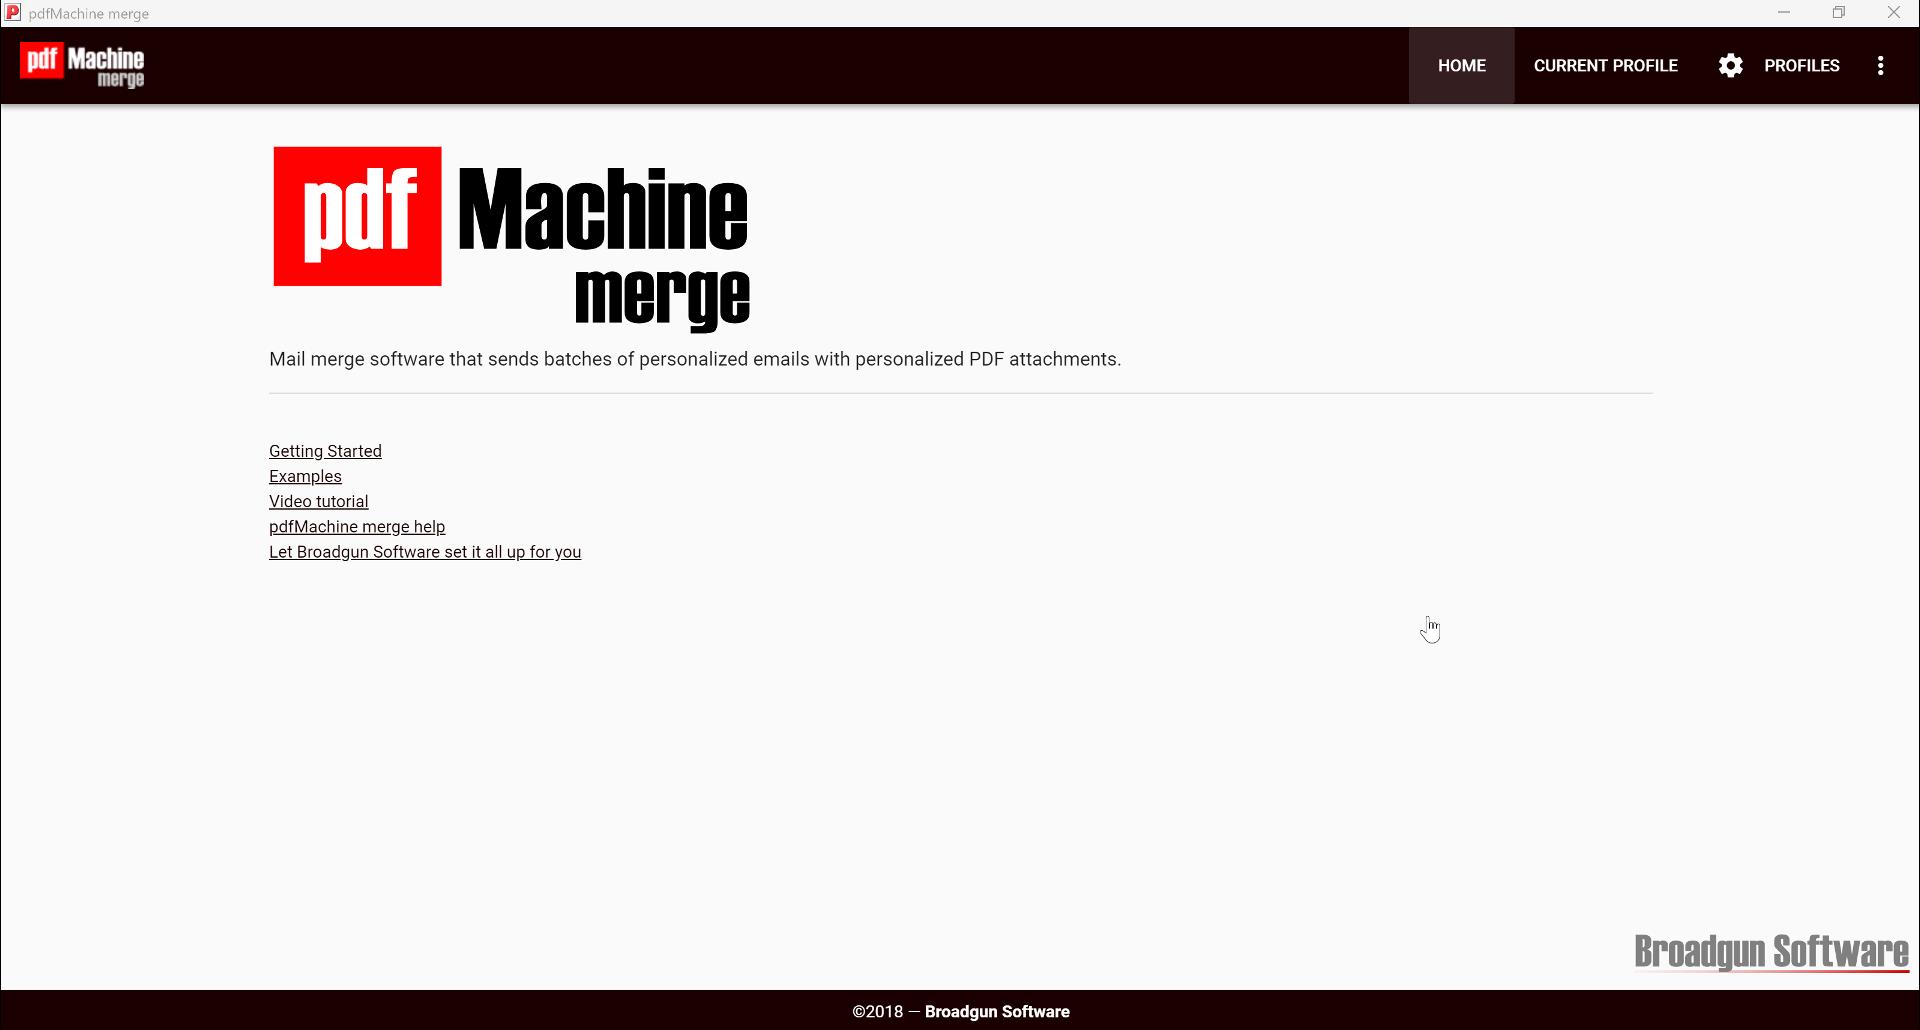 PdfMachine merge v2.0.7454.29860 [Ingles] [UL.IO] Pdfmachine-merge-short_First_Frame